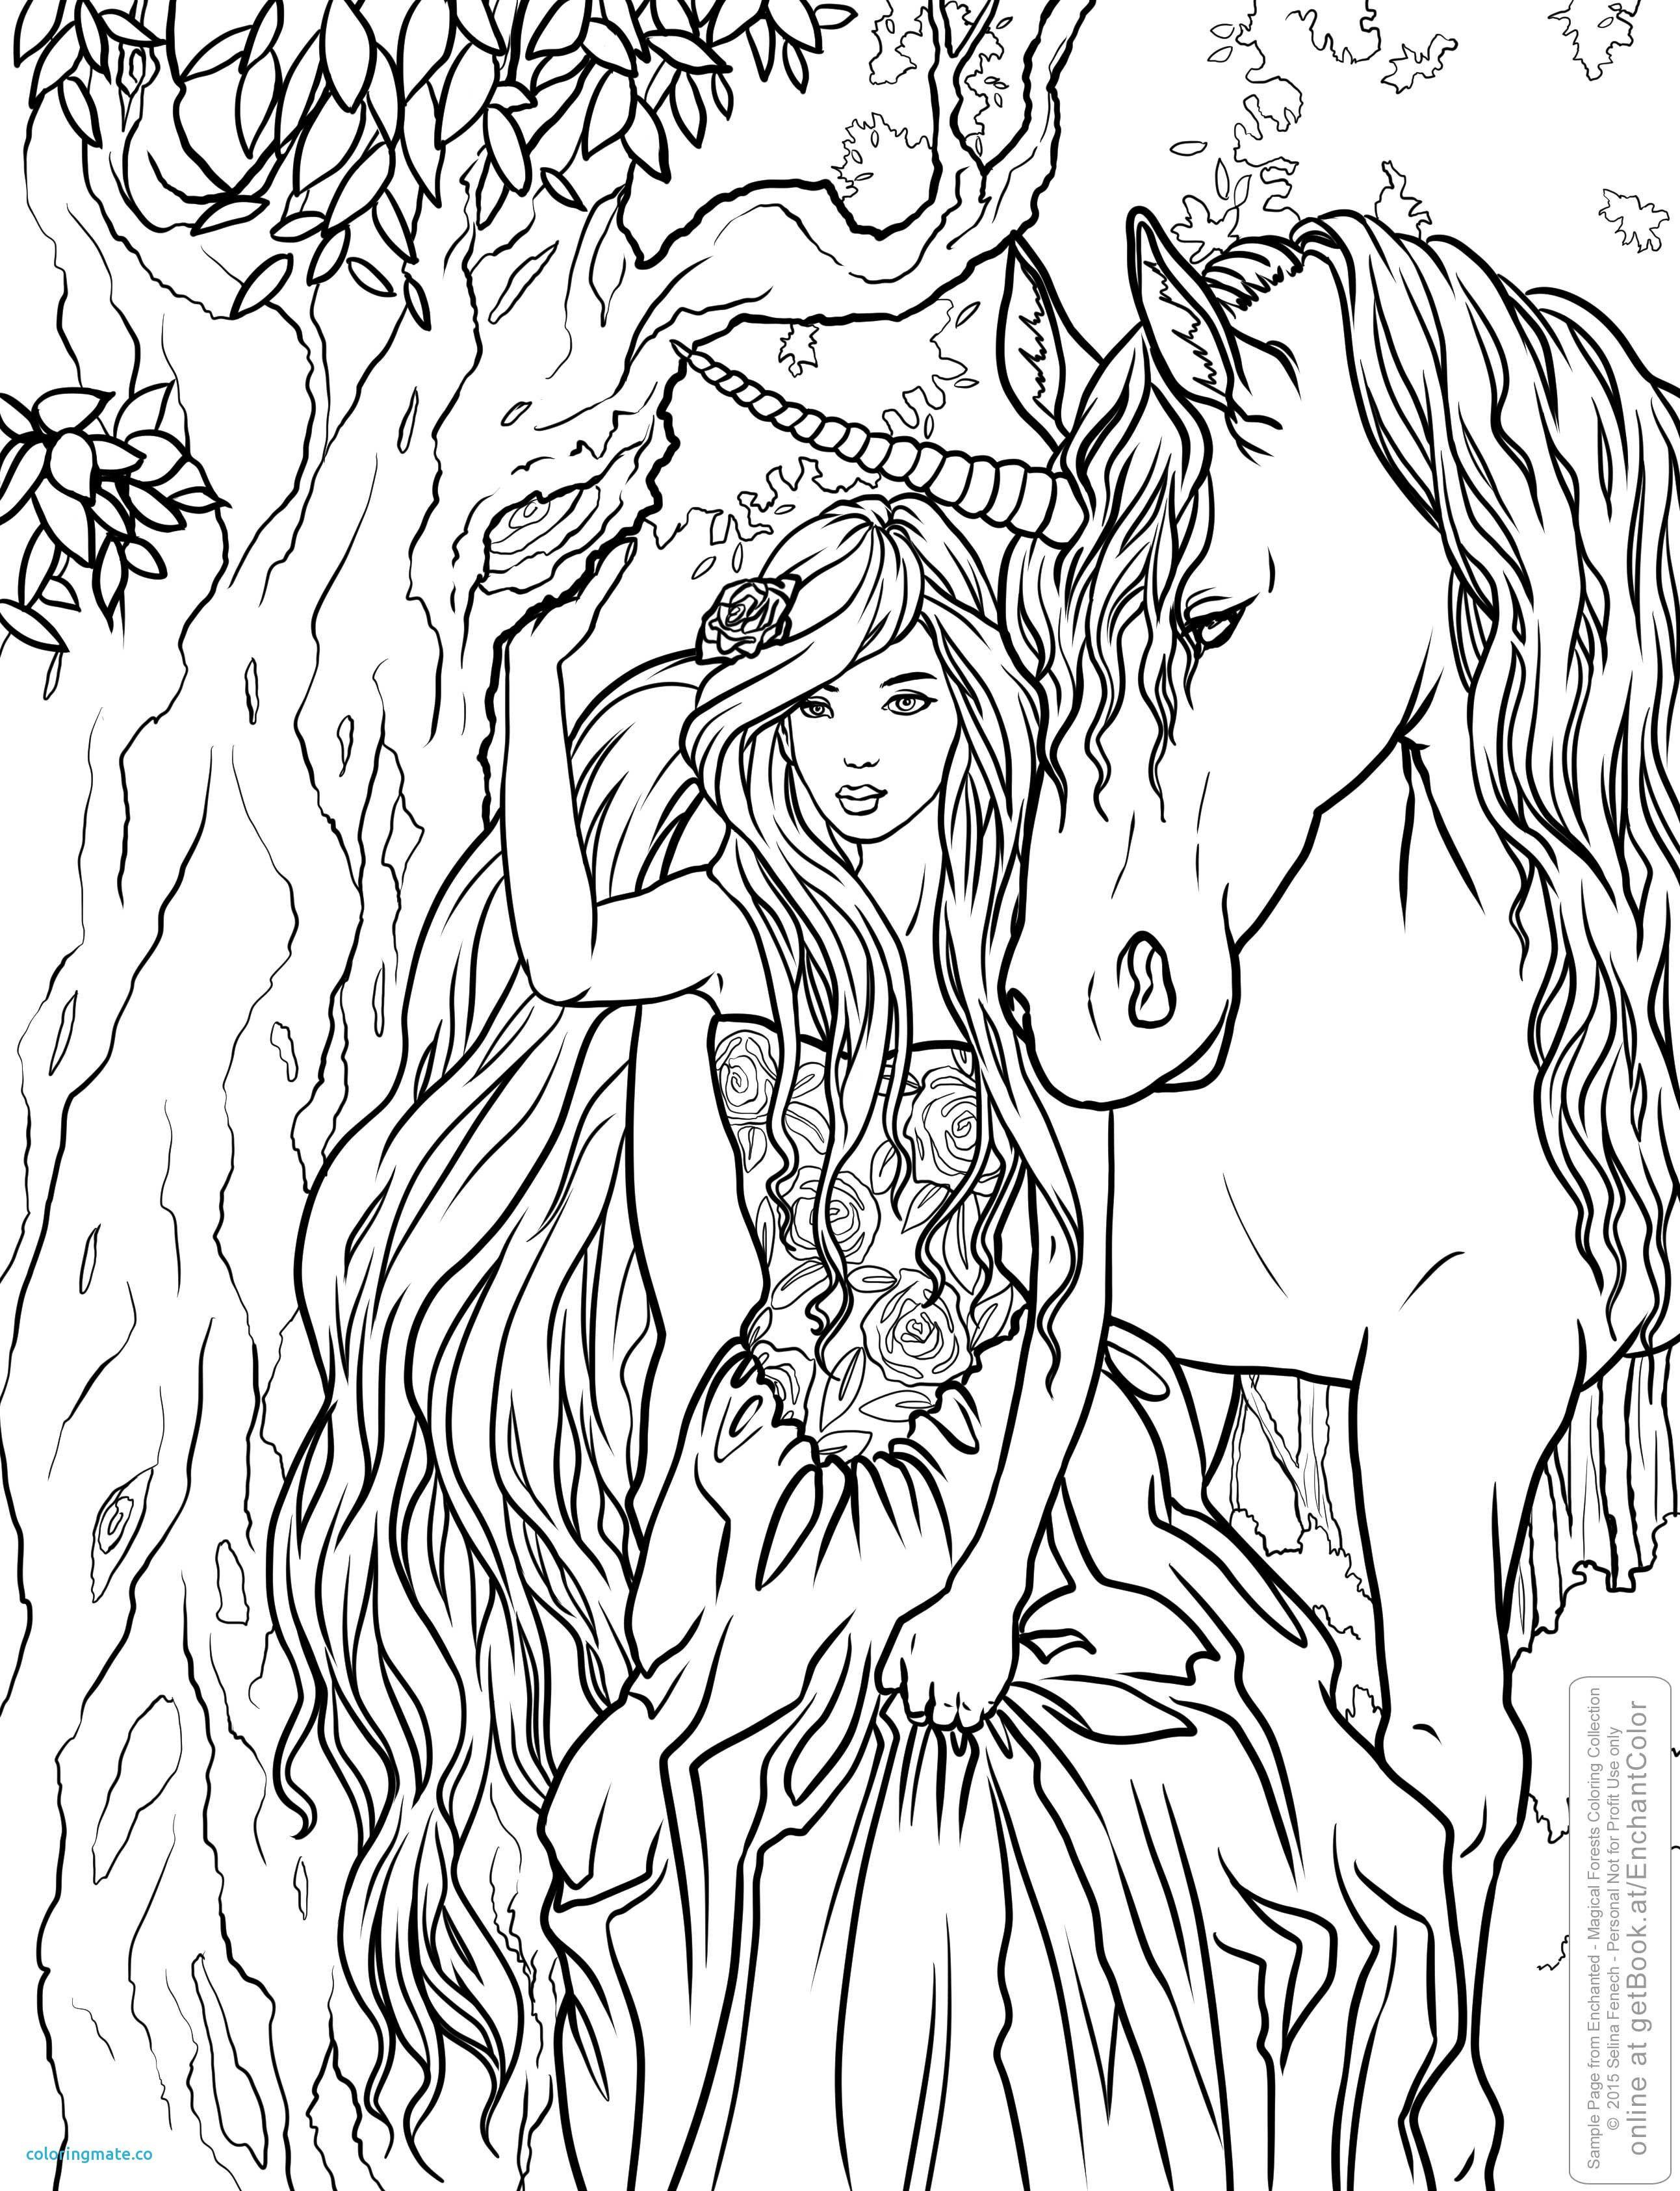 Coloriage Mandala Licorne Unique Coloring Selinafenech Enchanted Jpg 2585a 3371 Fantasy Of Coloriafes Disney Ausmalbilder Ausmalen Einhorn Zeichnen